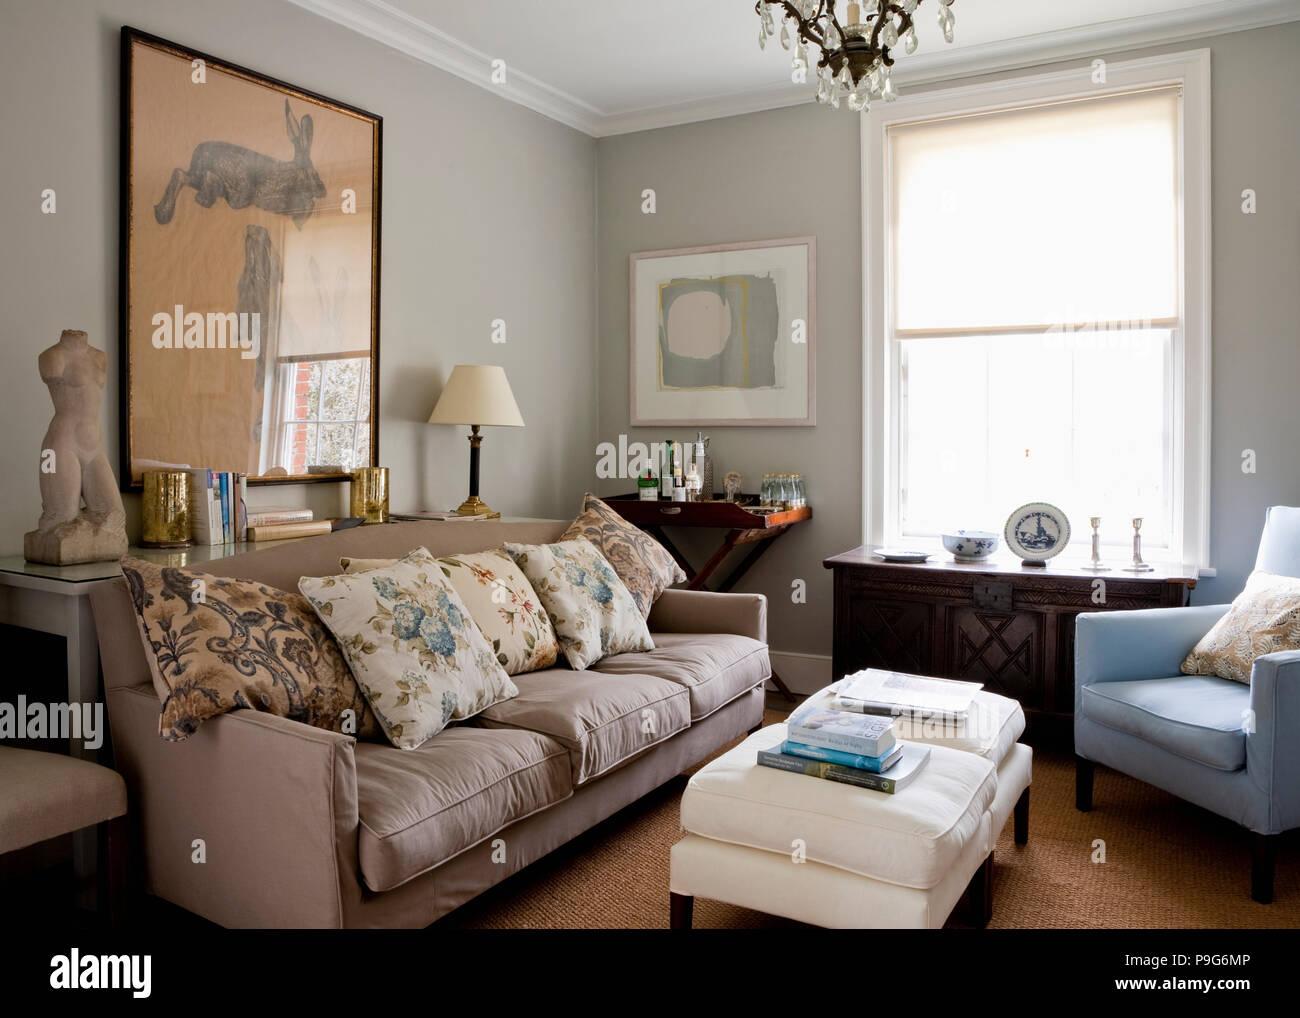 florale bettw sche kissen beige sofa in hellem grau. Black Bedroom Furniture Sets. Home Design Ideas